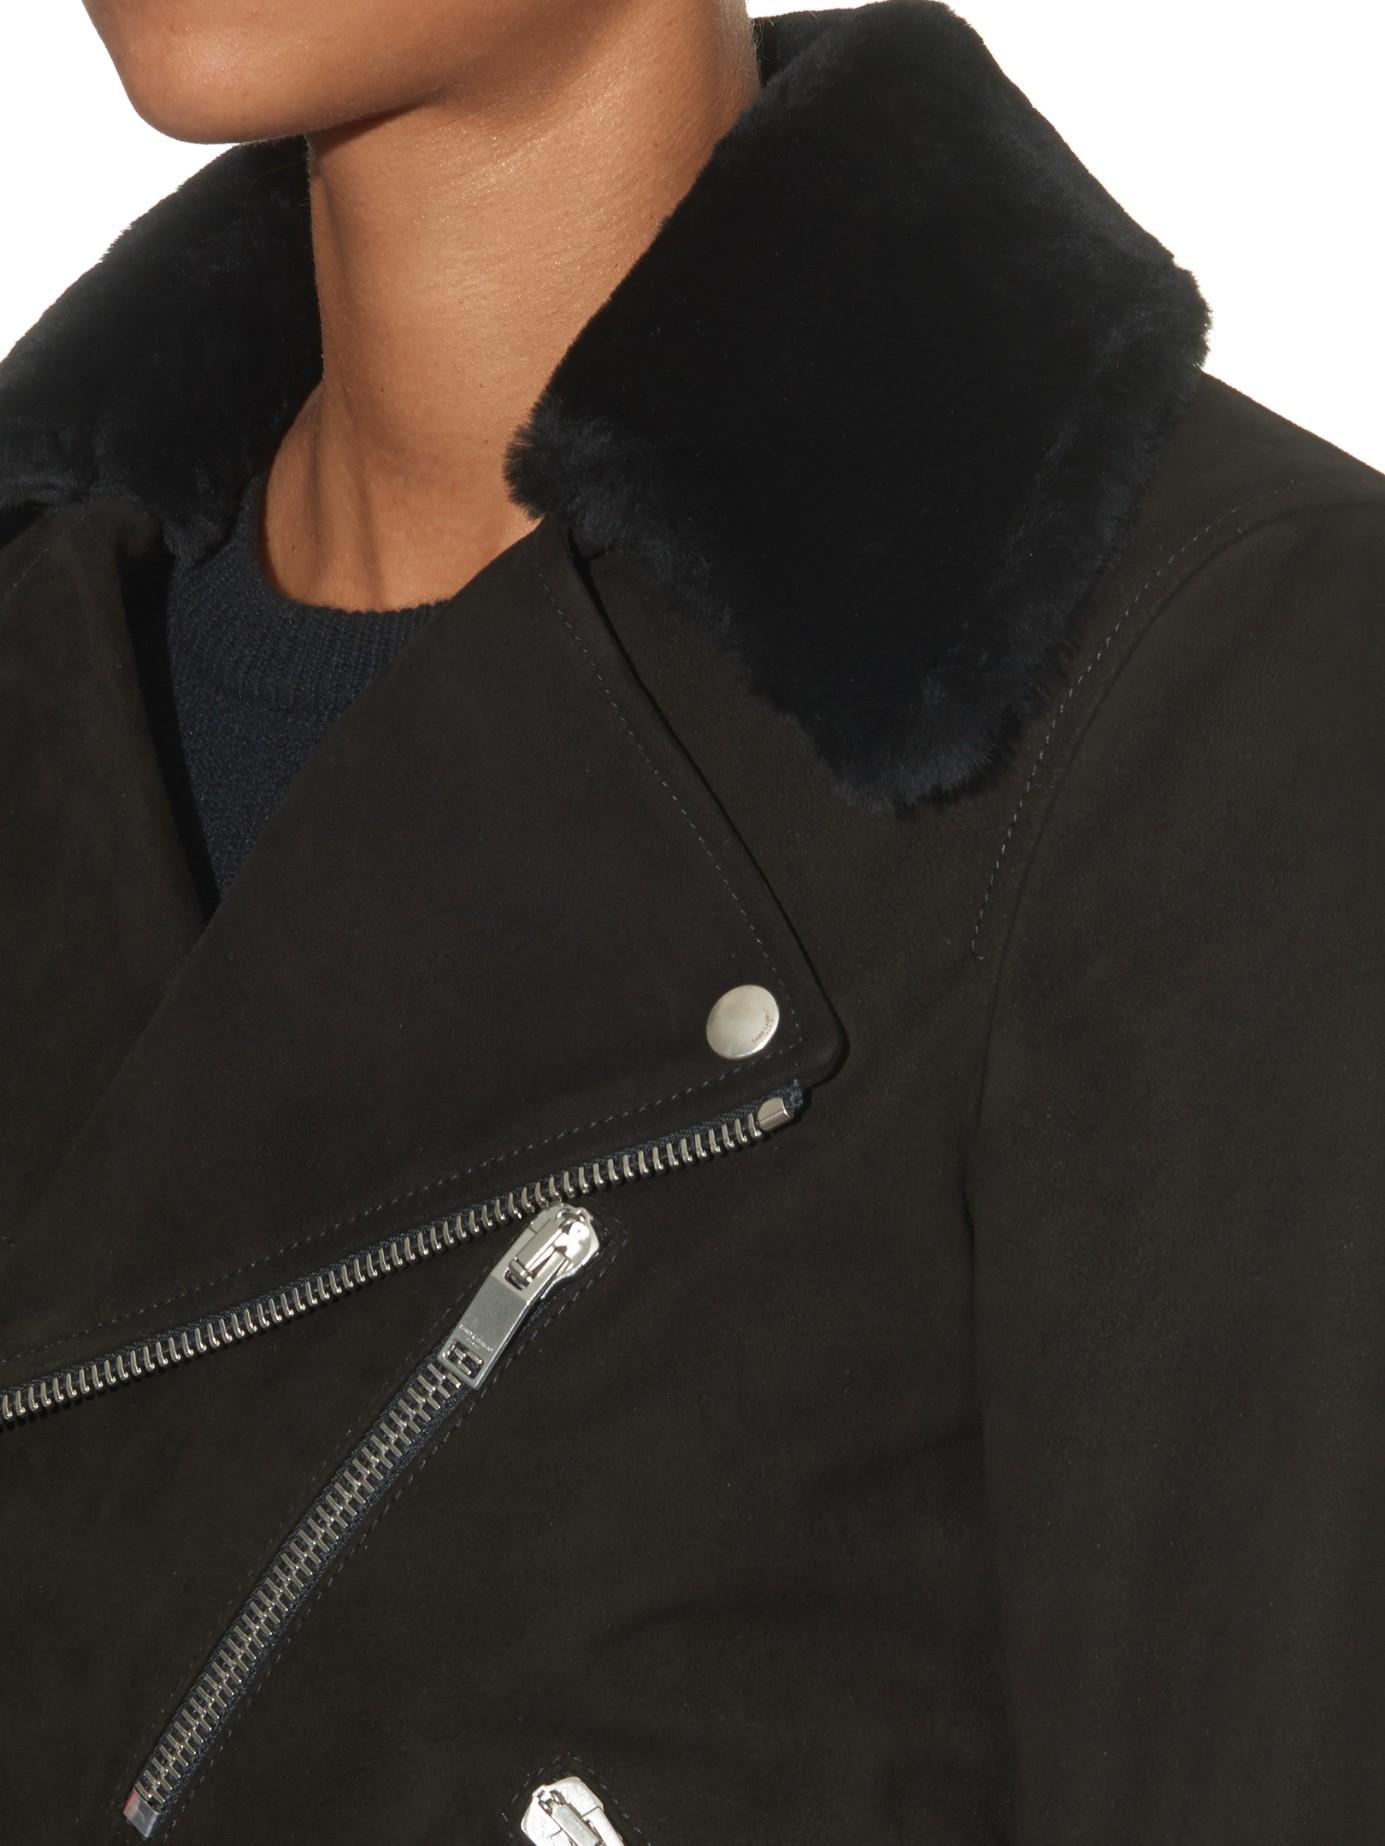 30e23688d77 Saint Laurent Shearling-Collar Suede Biker Jacket in Black - Lyst